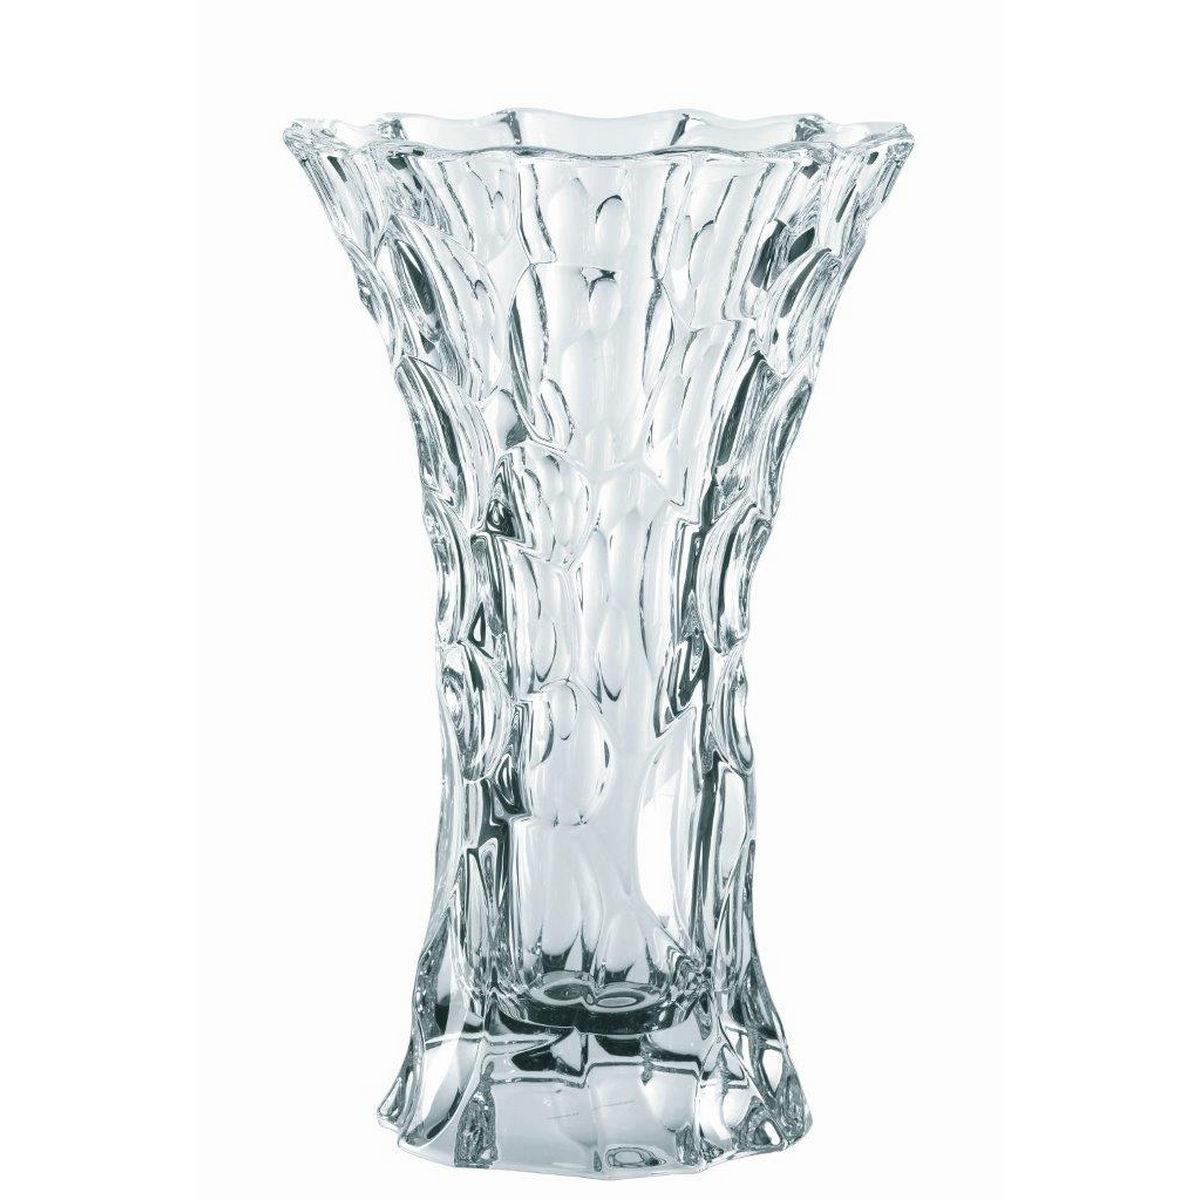 Sphere Vaza Cristalin 24 Cm 2021 aranjareamesei.ro